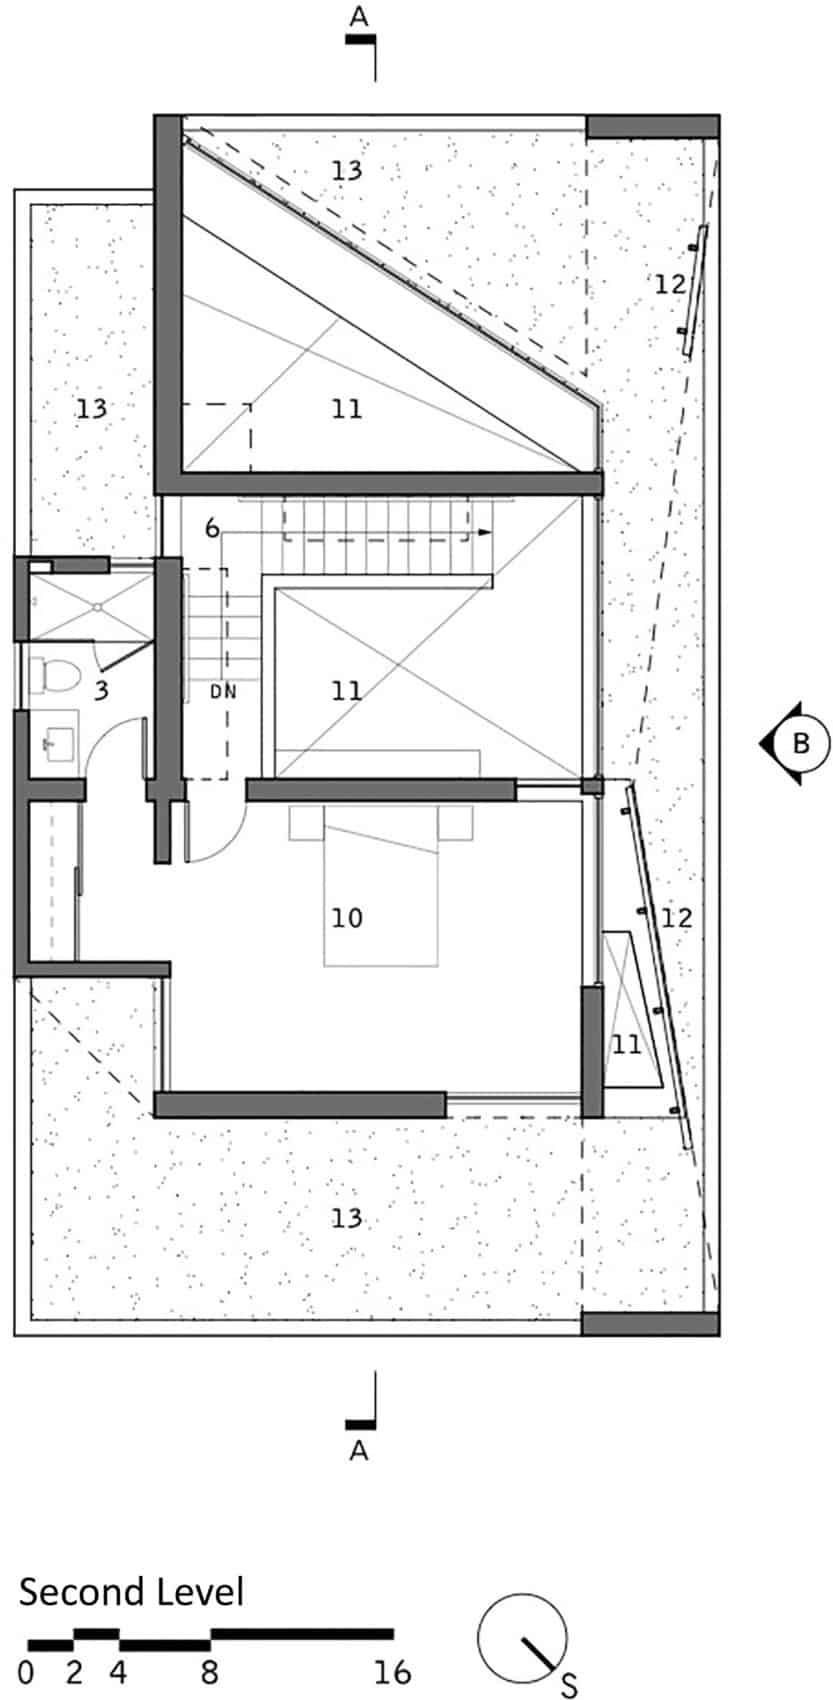 Ehrlich Retreat + by John Friedman Alice Kimm Architects (18)